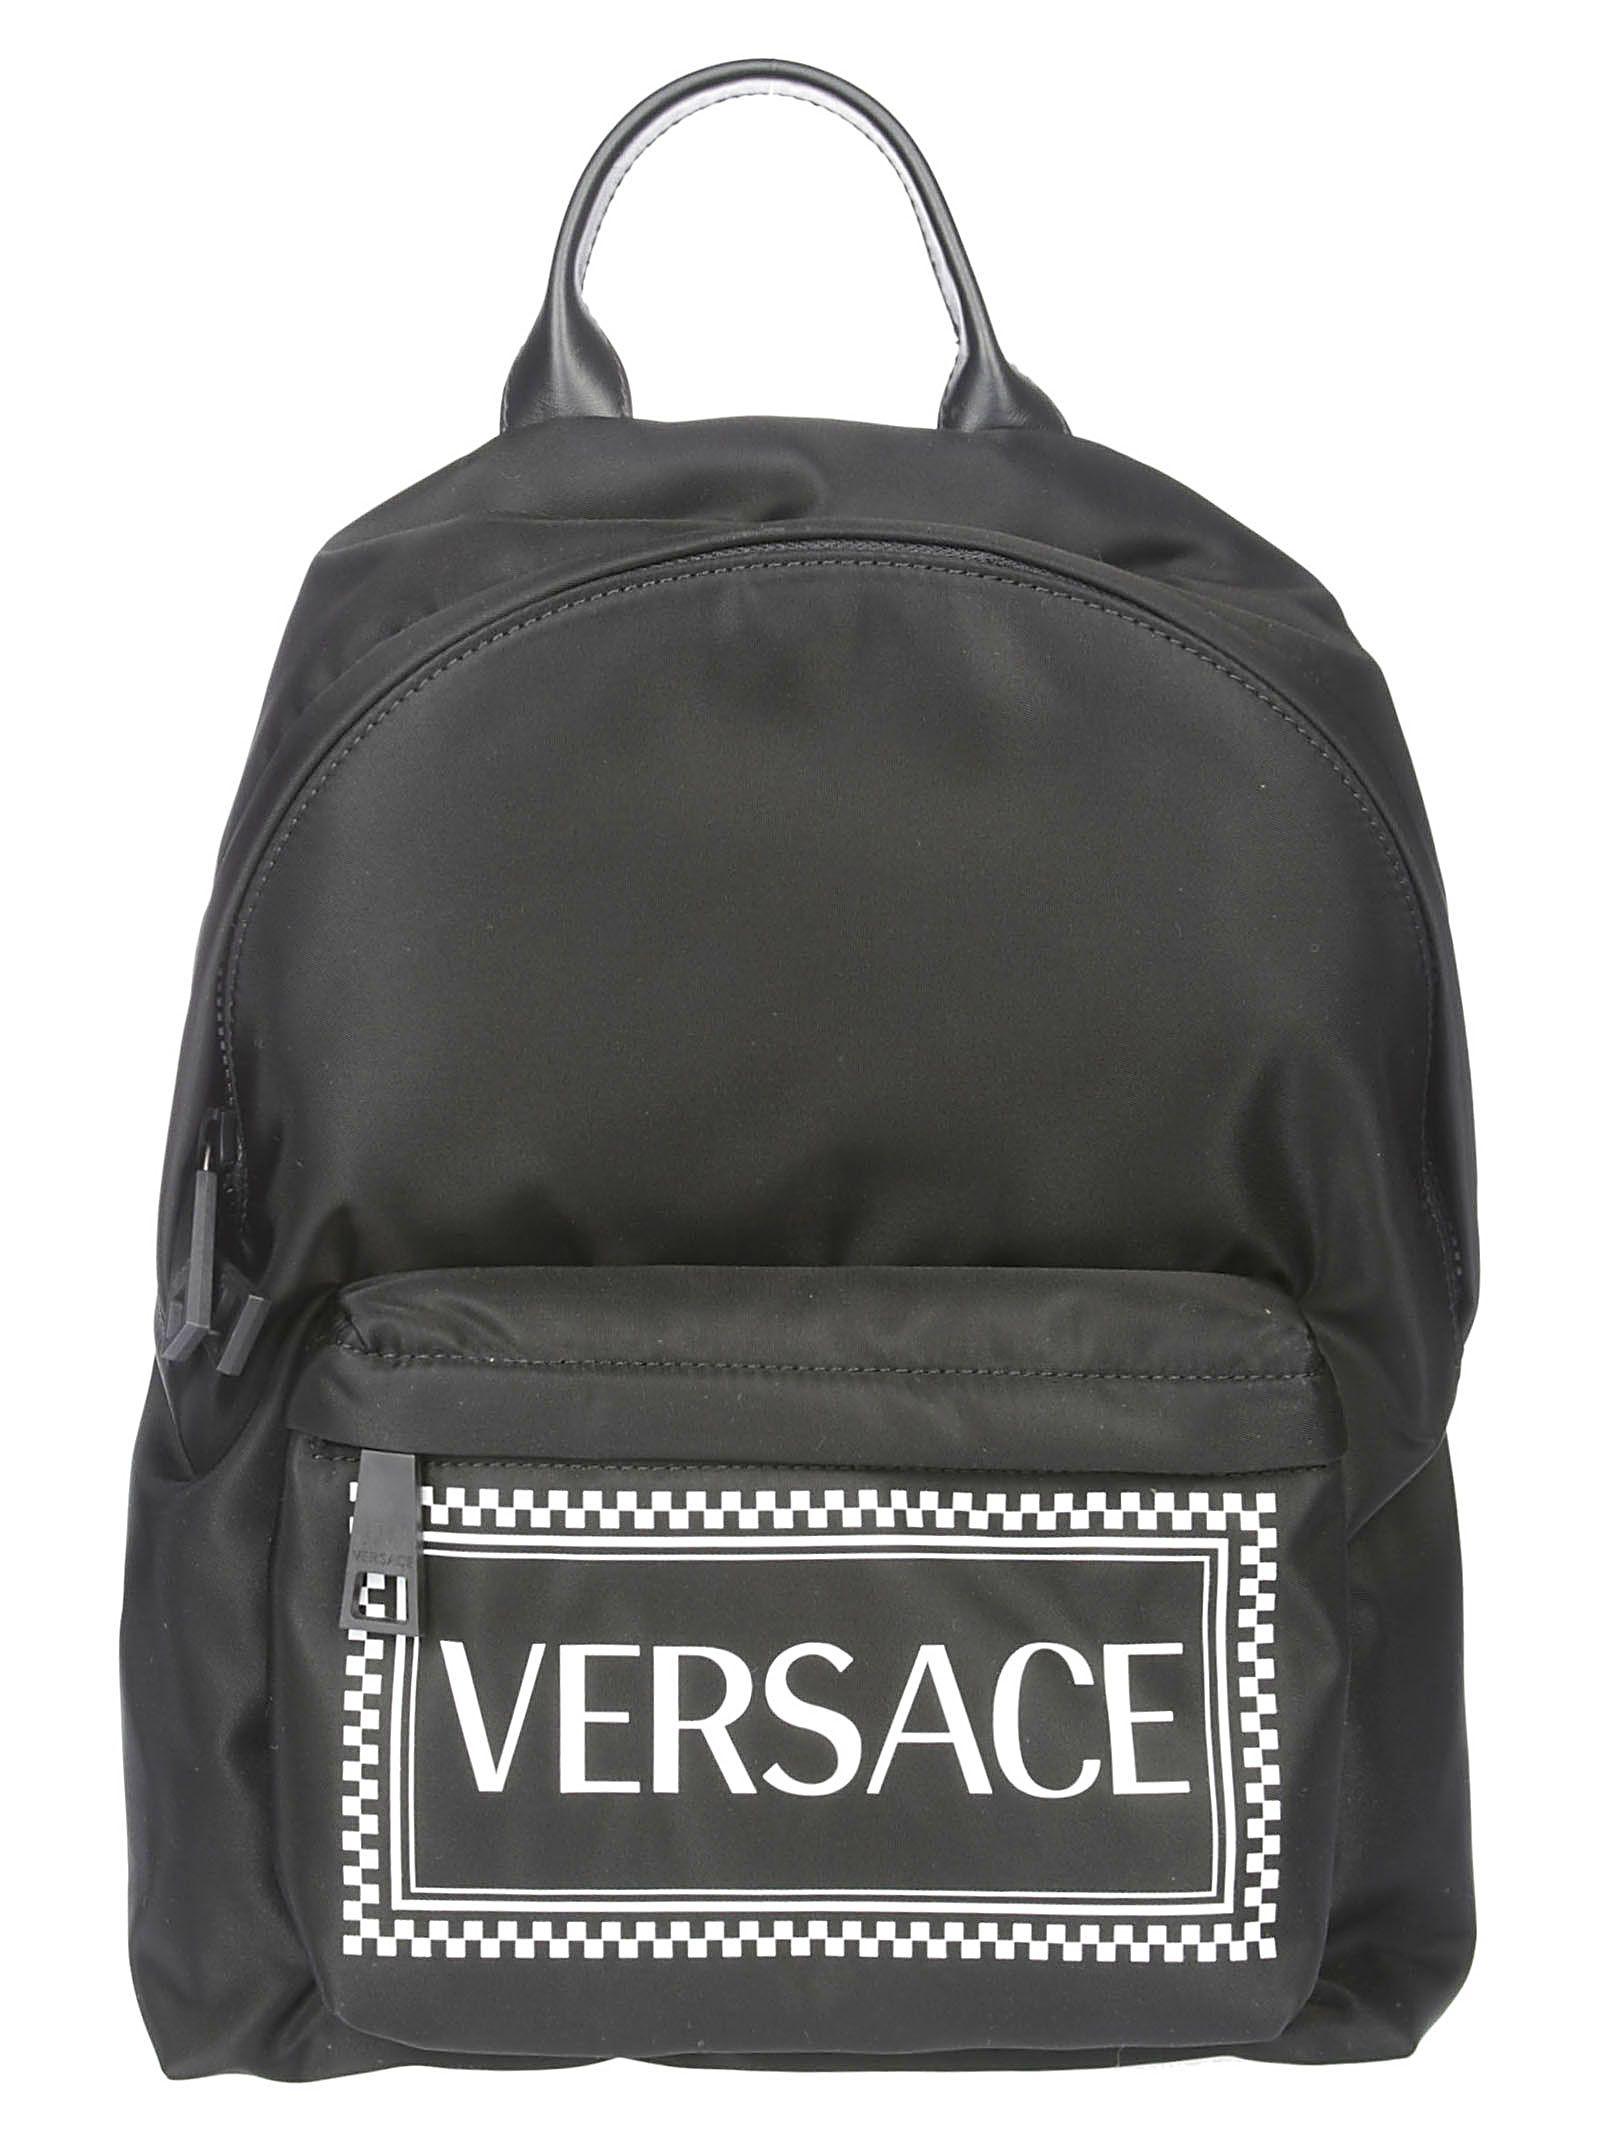 d7abfbea9381 Versace Versace Logo Print Backpack - Black - 10833933